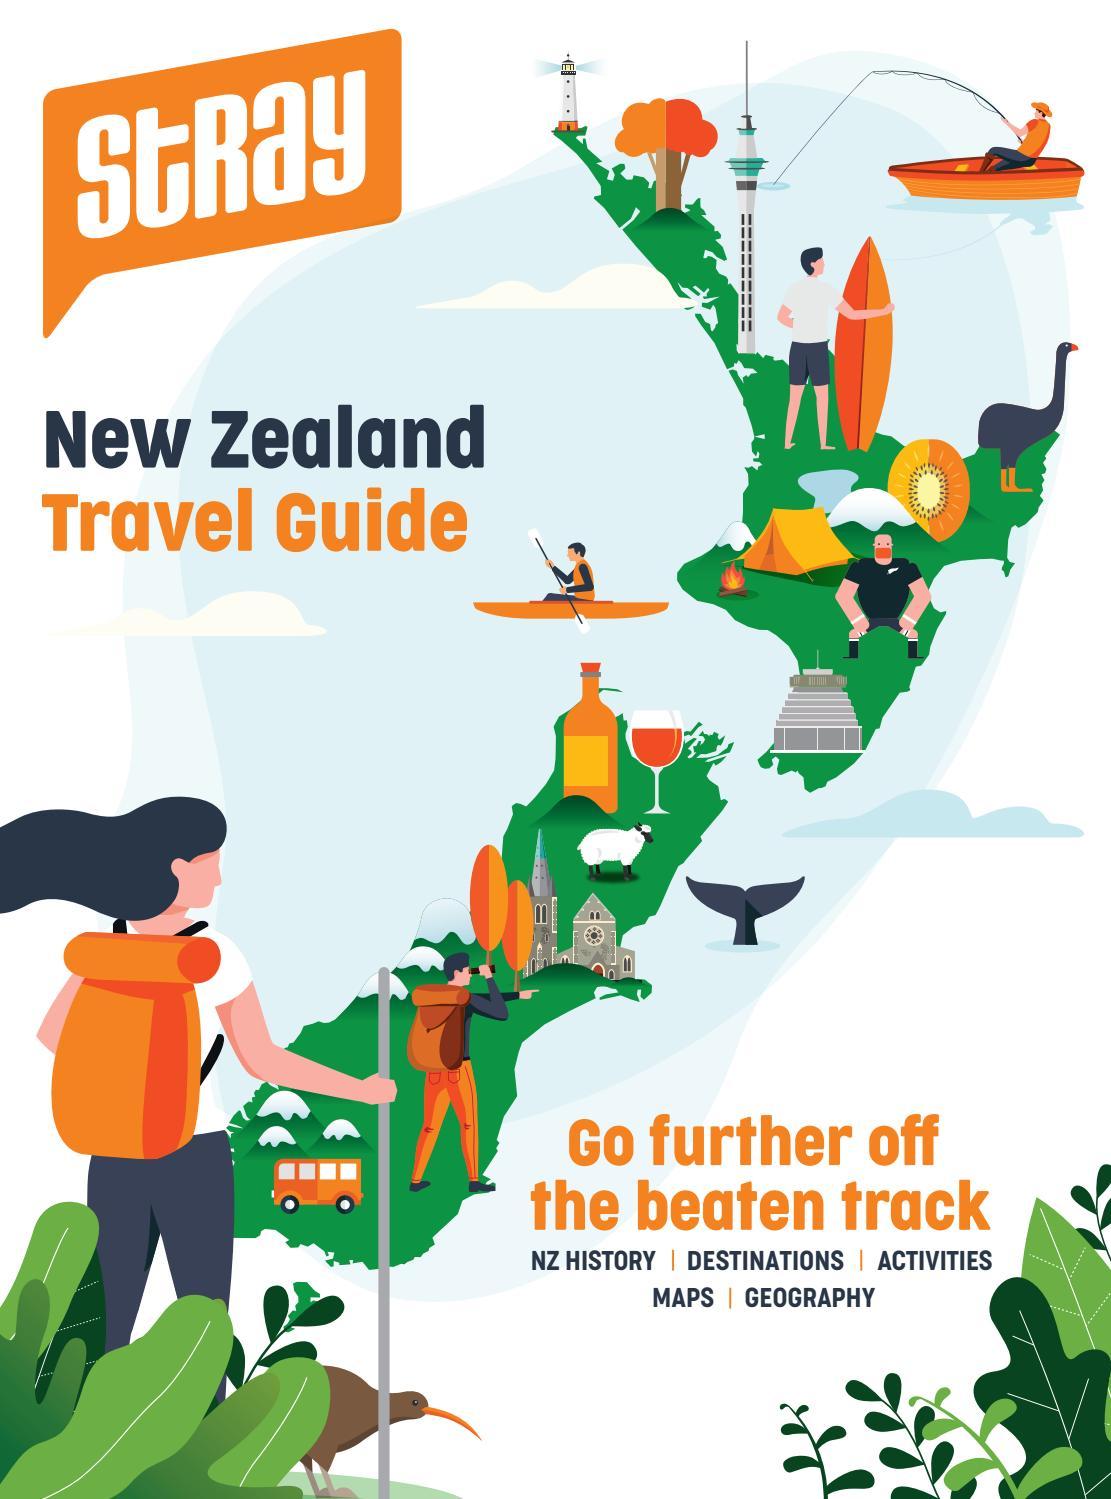 Fiordland Southland New Zealand  Vintage Railroad Train Travel Poster Print